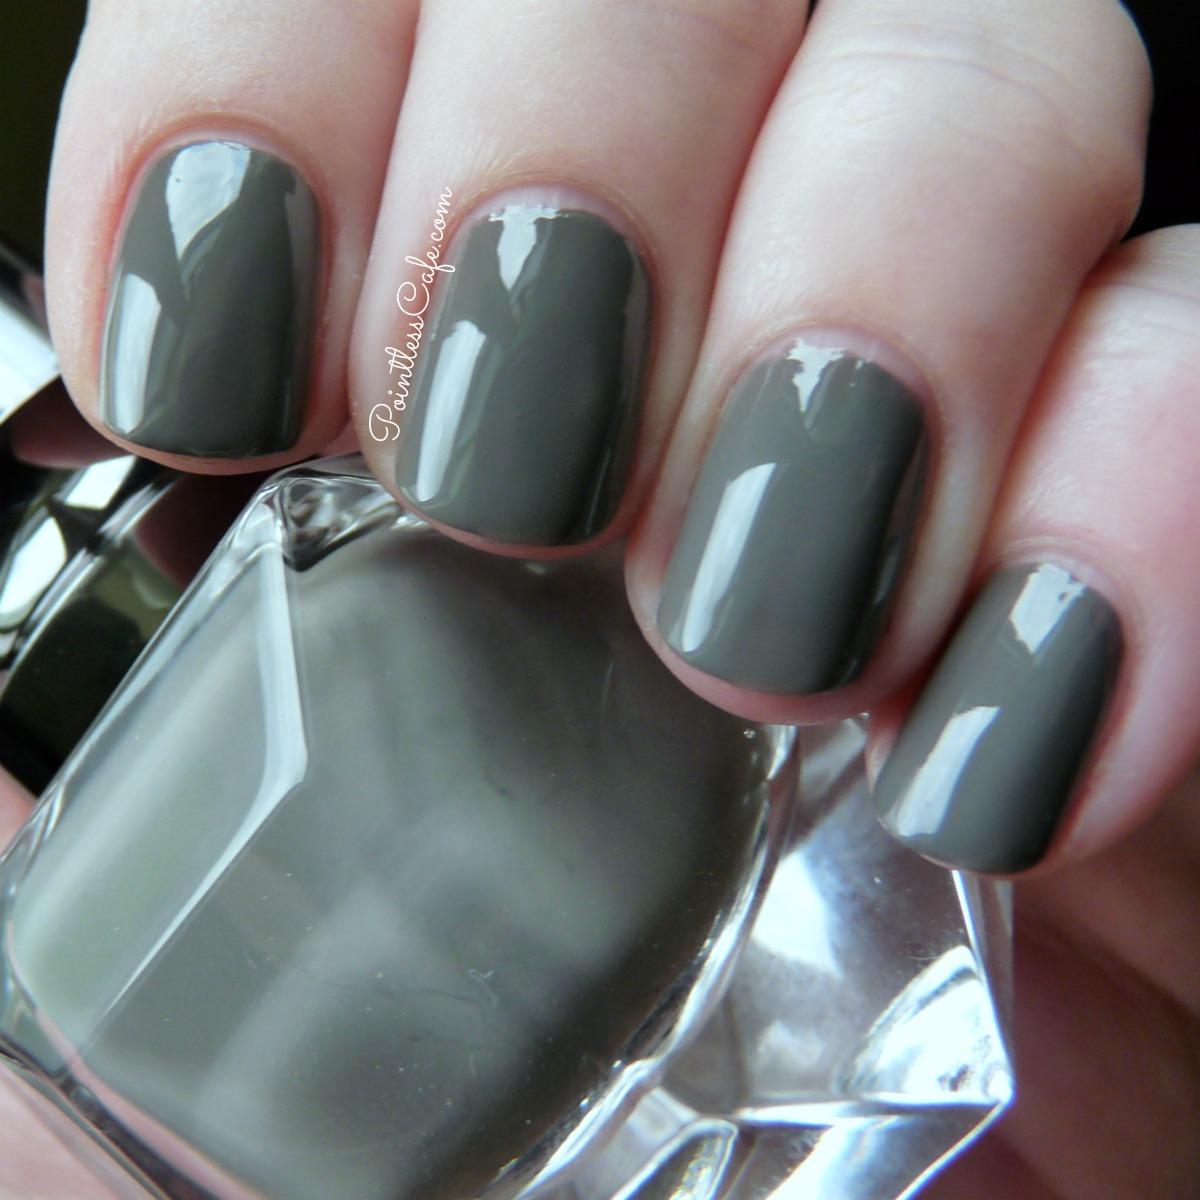 christian louboutin noir nail polish. Black Bedroom Furniture Sets. Home Design Ideas